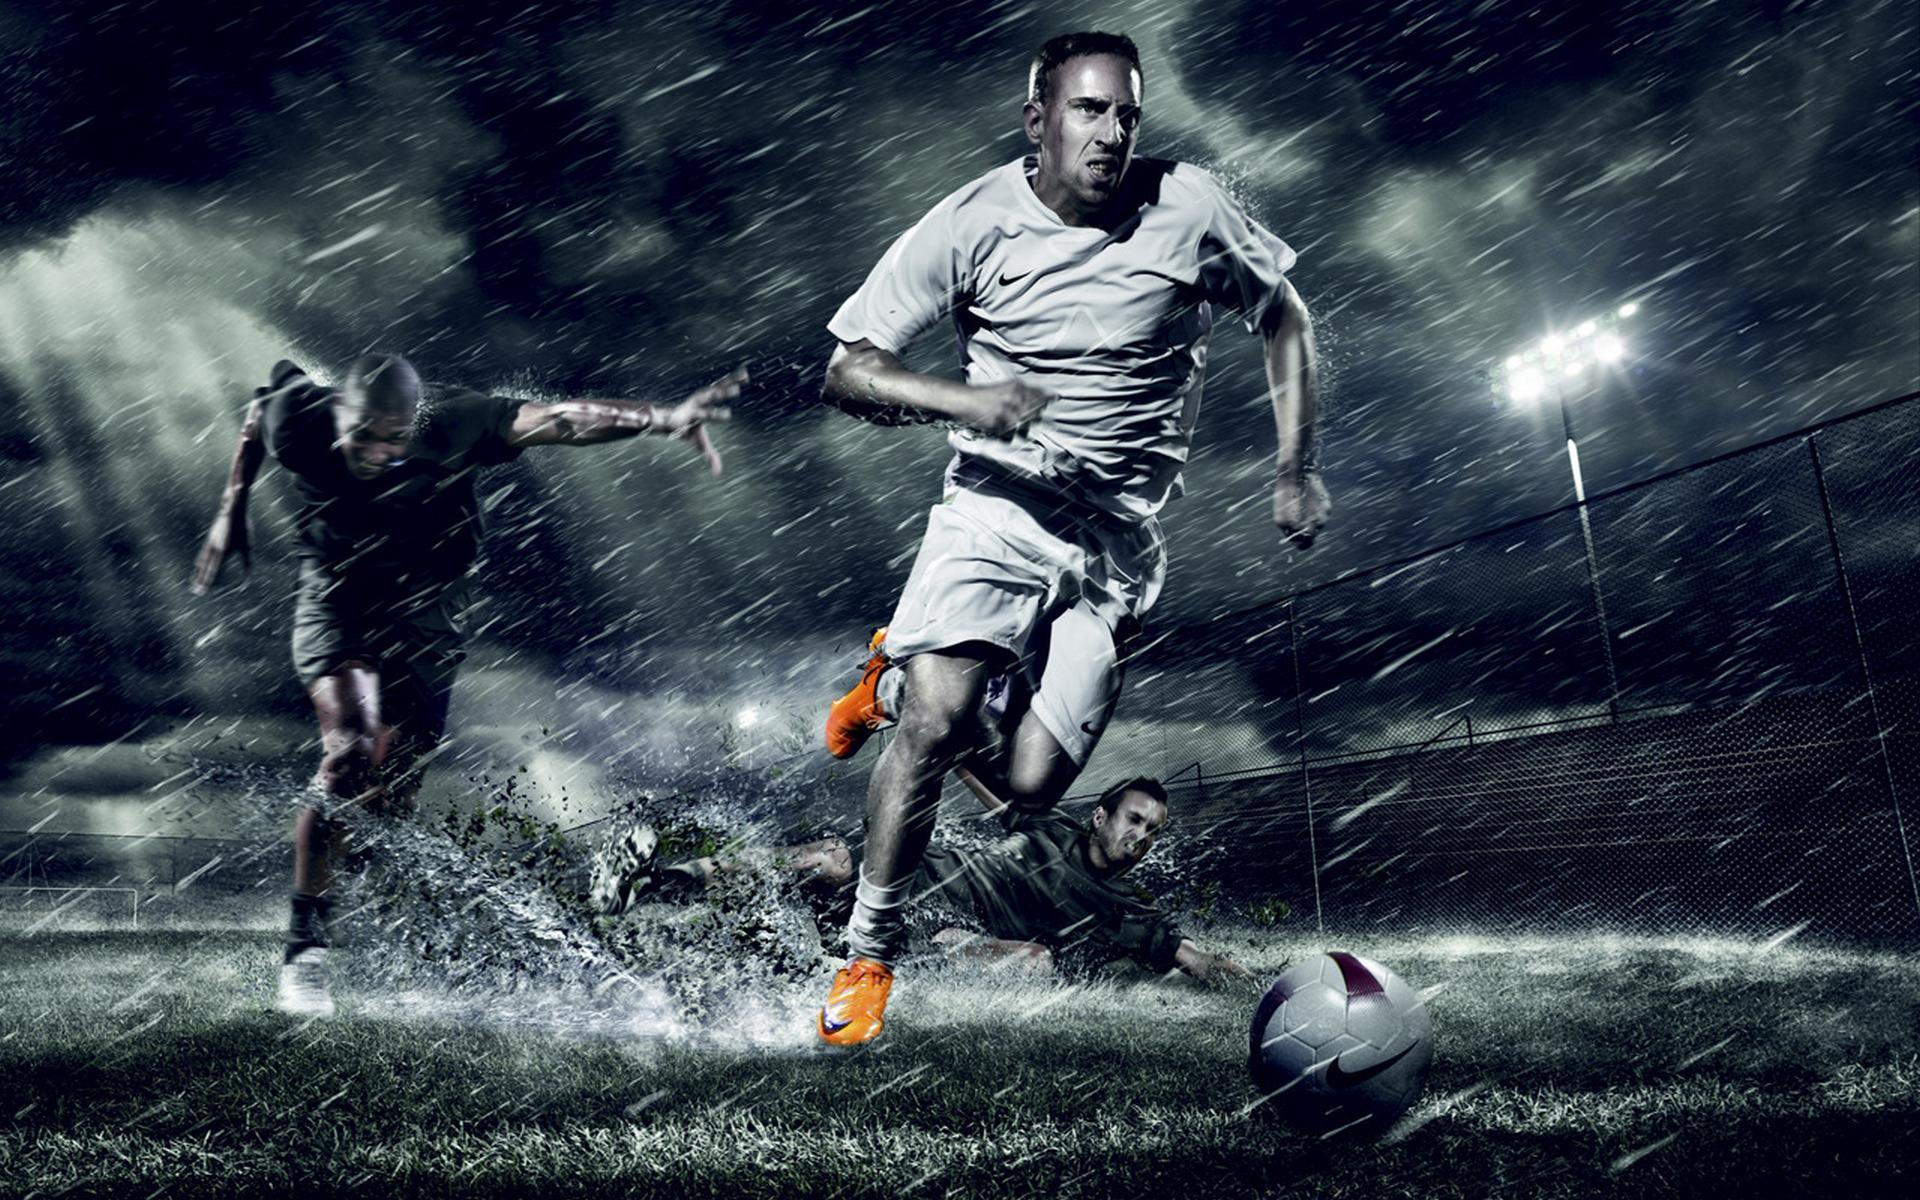 futbol-myach-voda-bryizgi.jpg